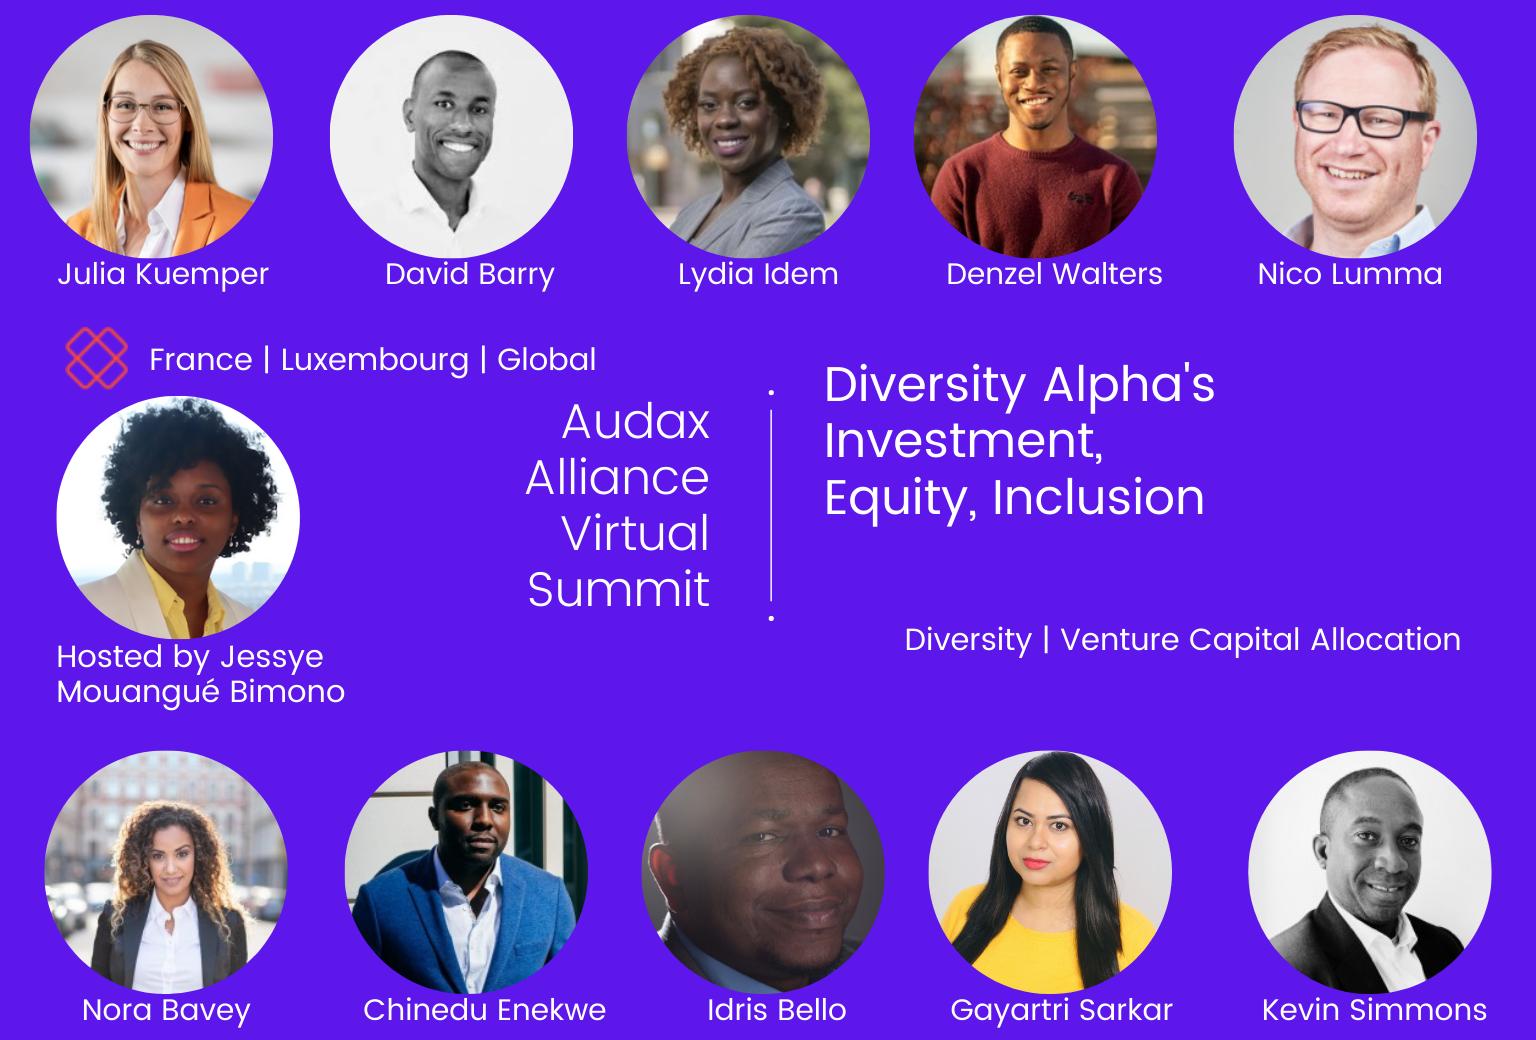 Audax Alliance Virtual Summit